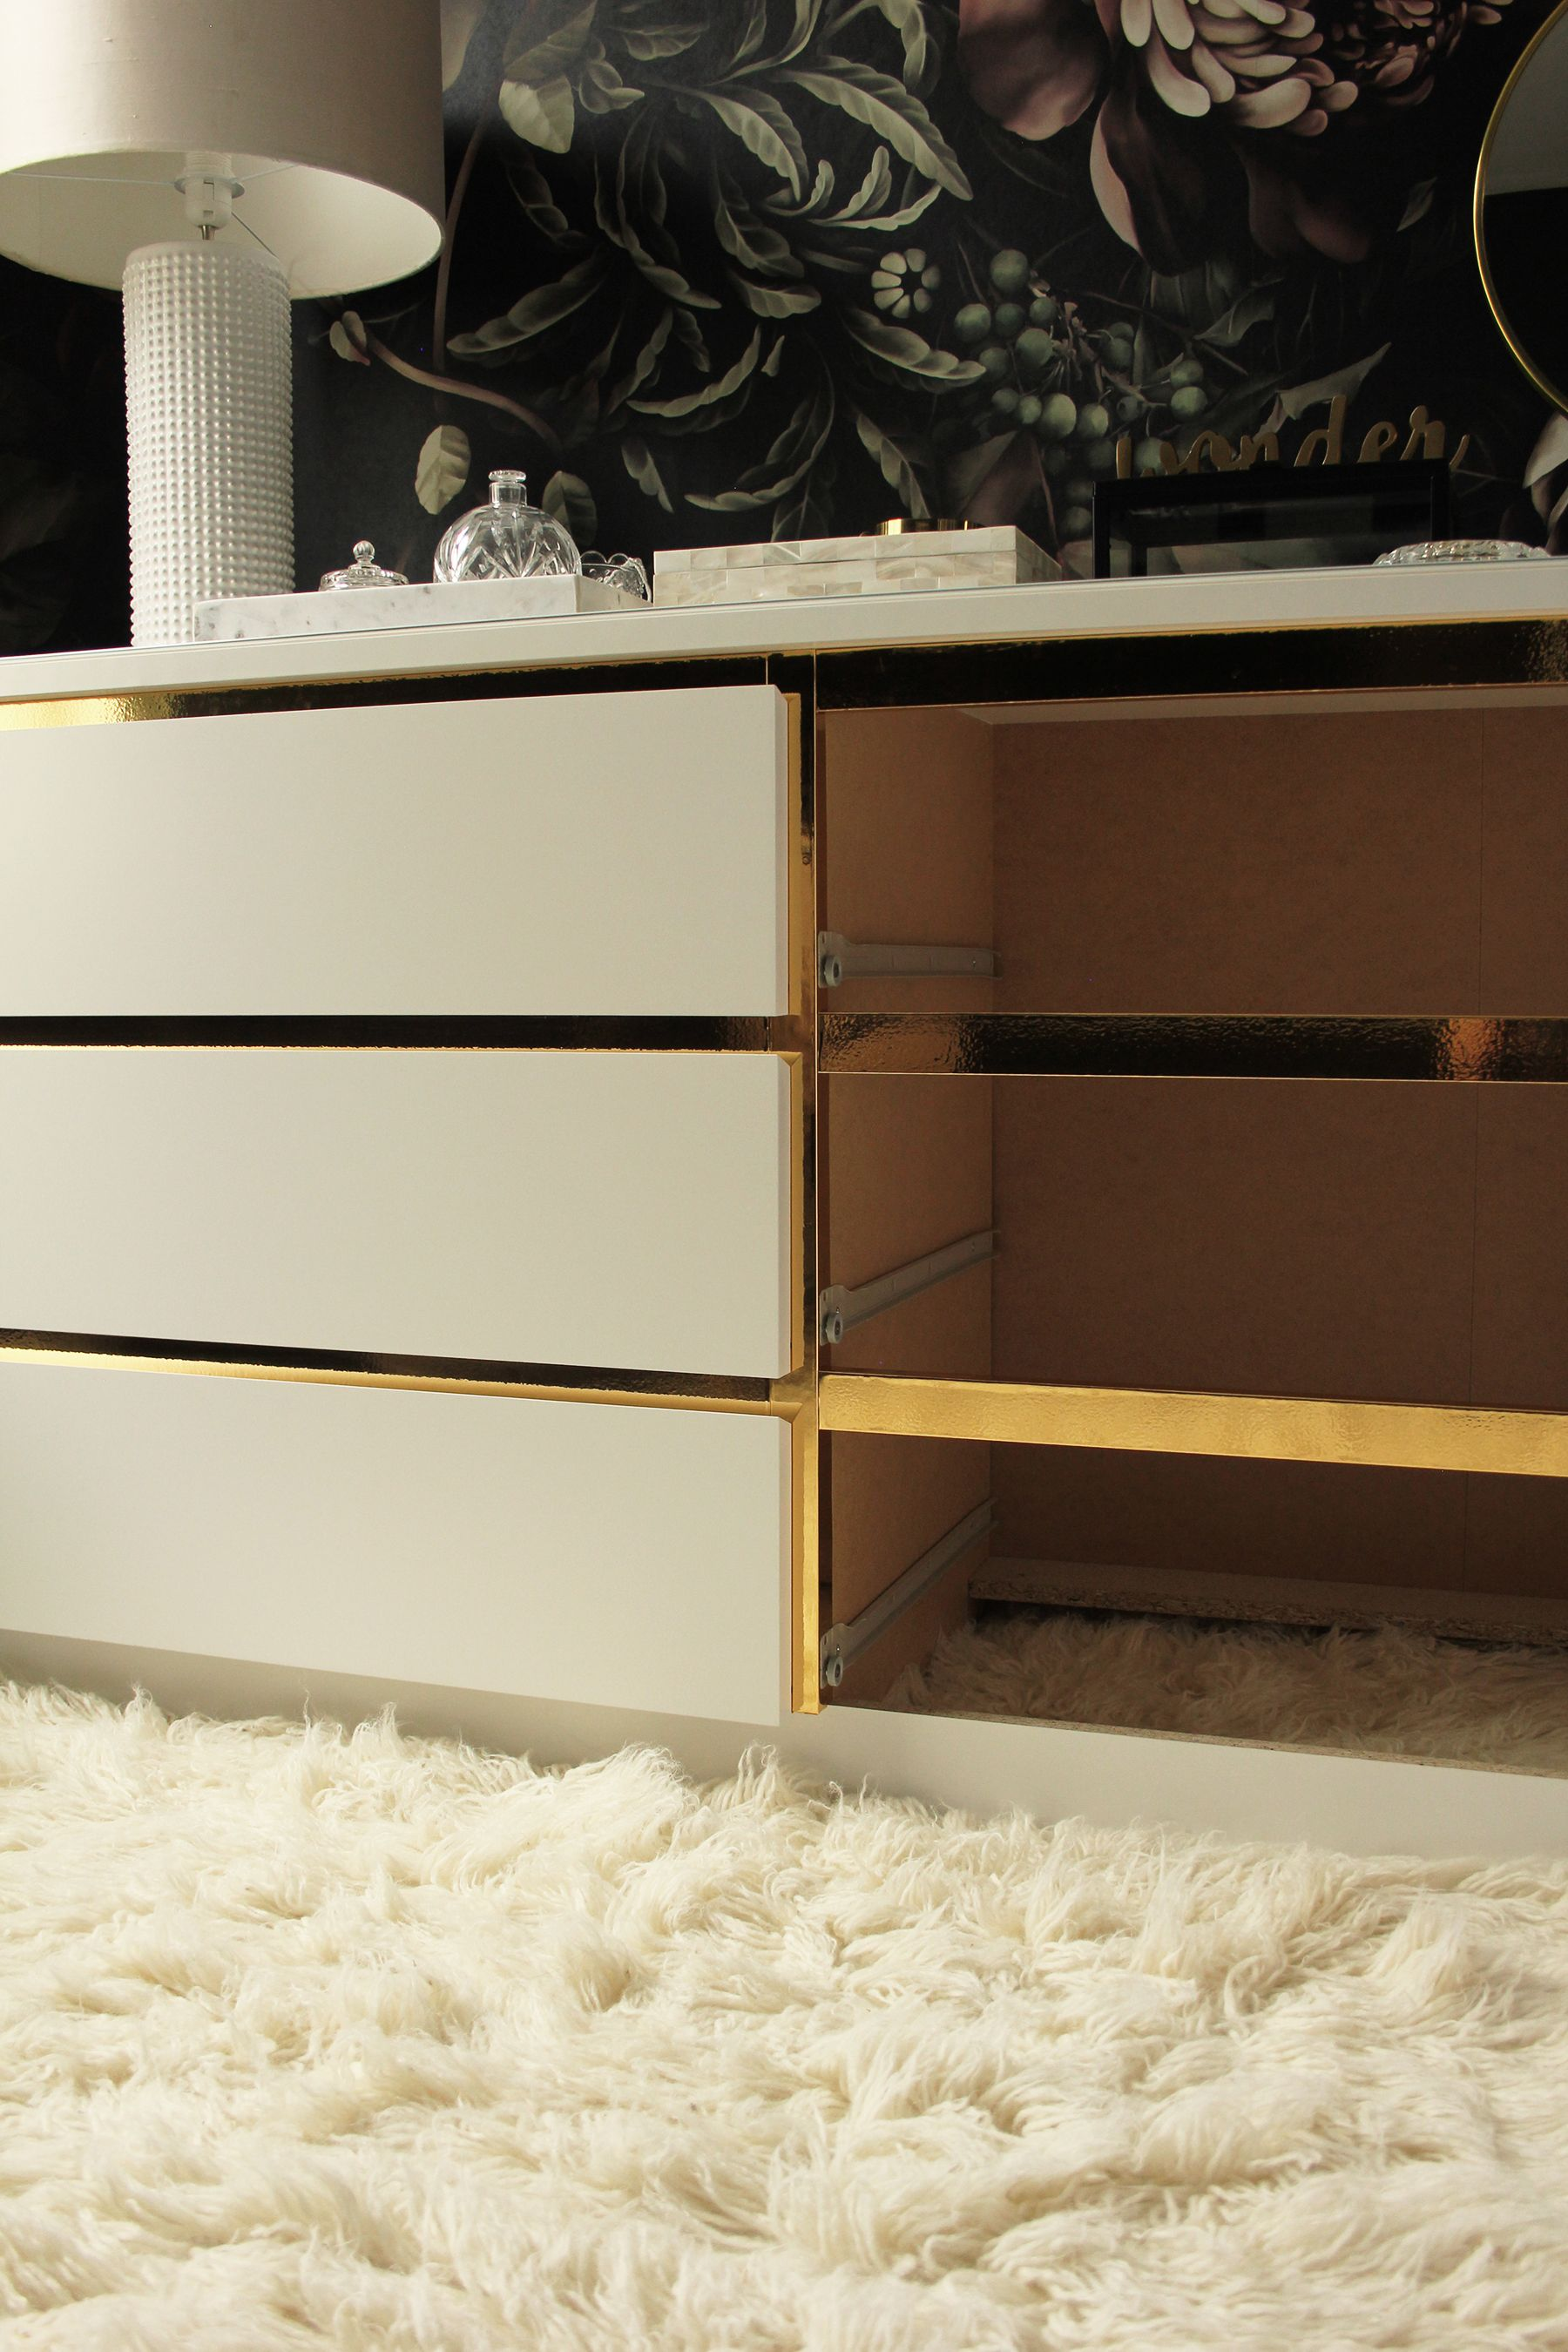 Preciously Me Blog Diy Ikea Hack Customize And Glamorize A